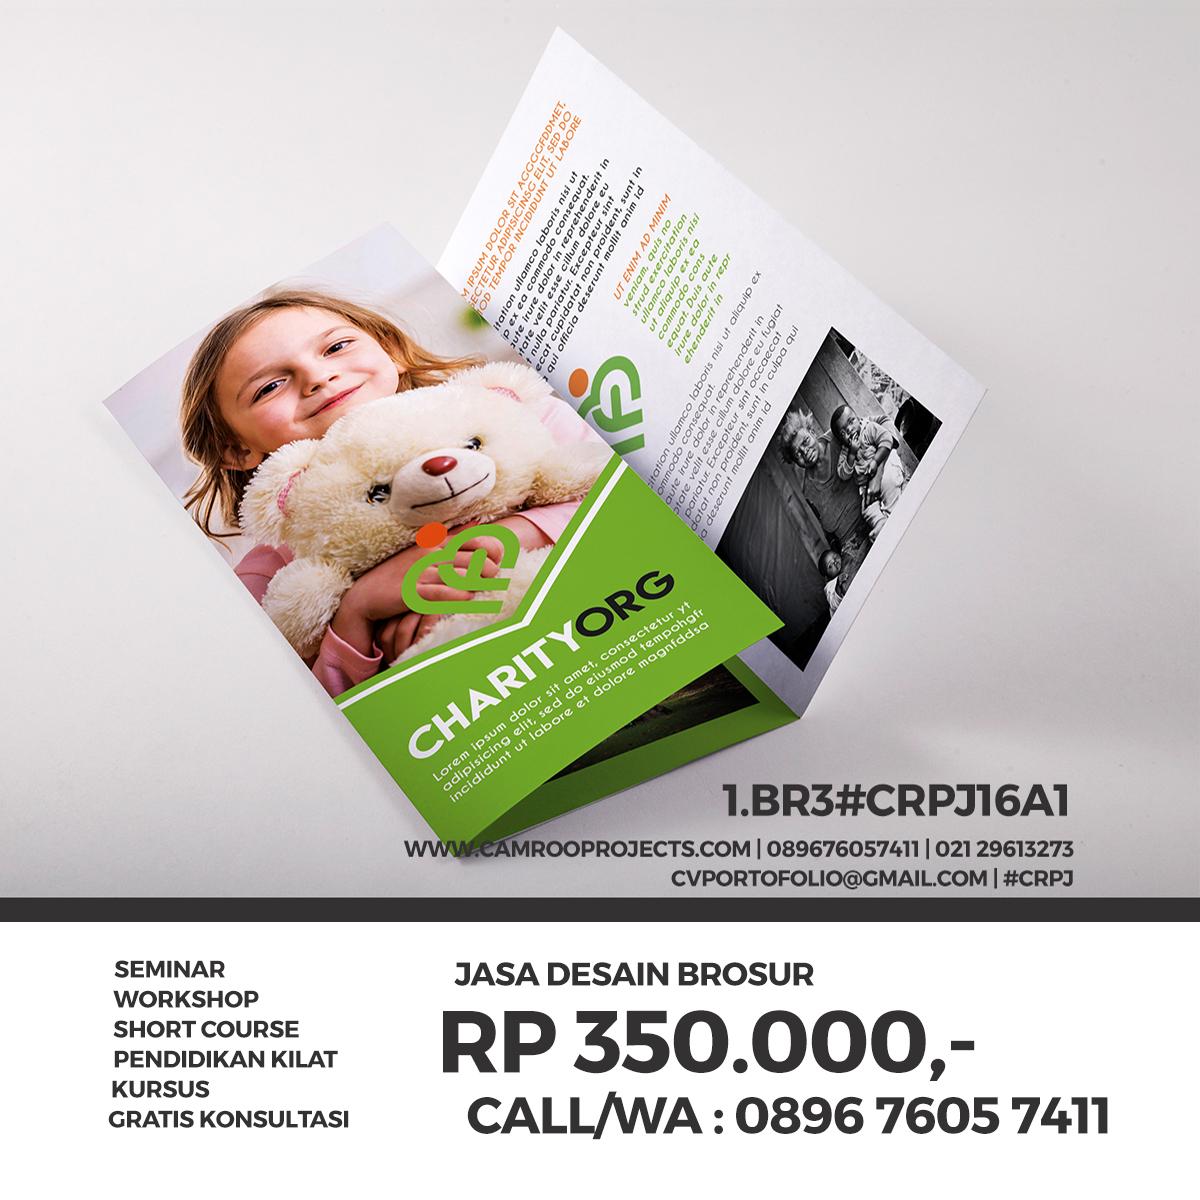 Jasa Desain Brosur/Flyer Di Jakarta